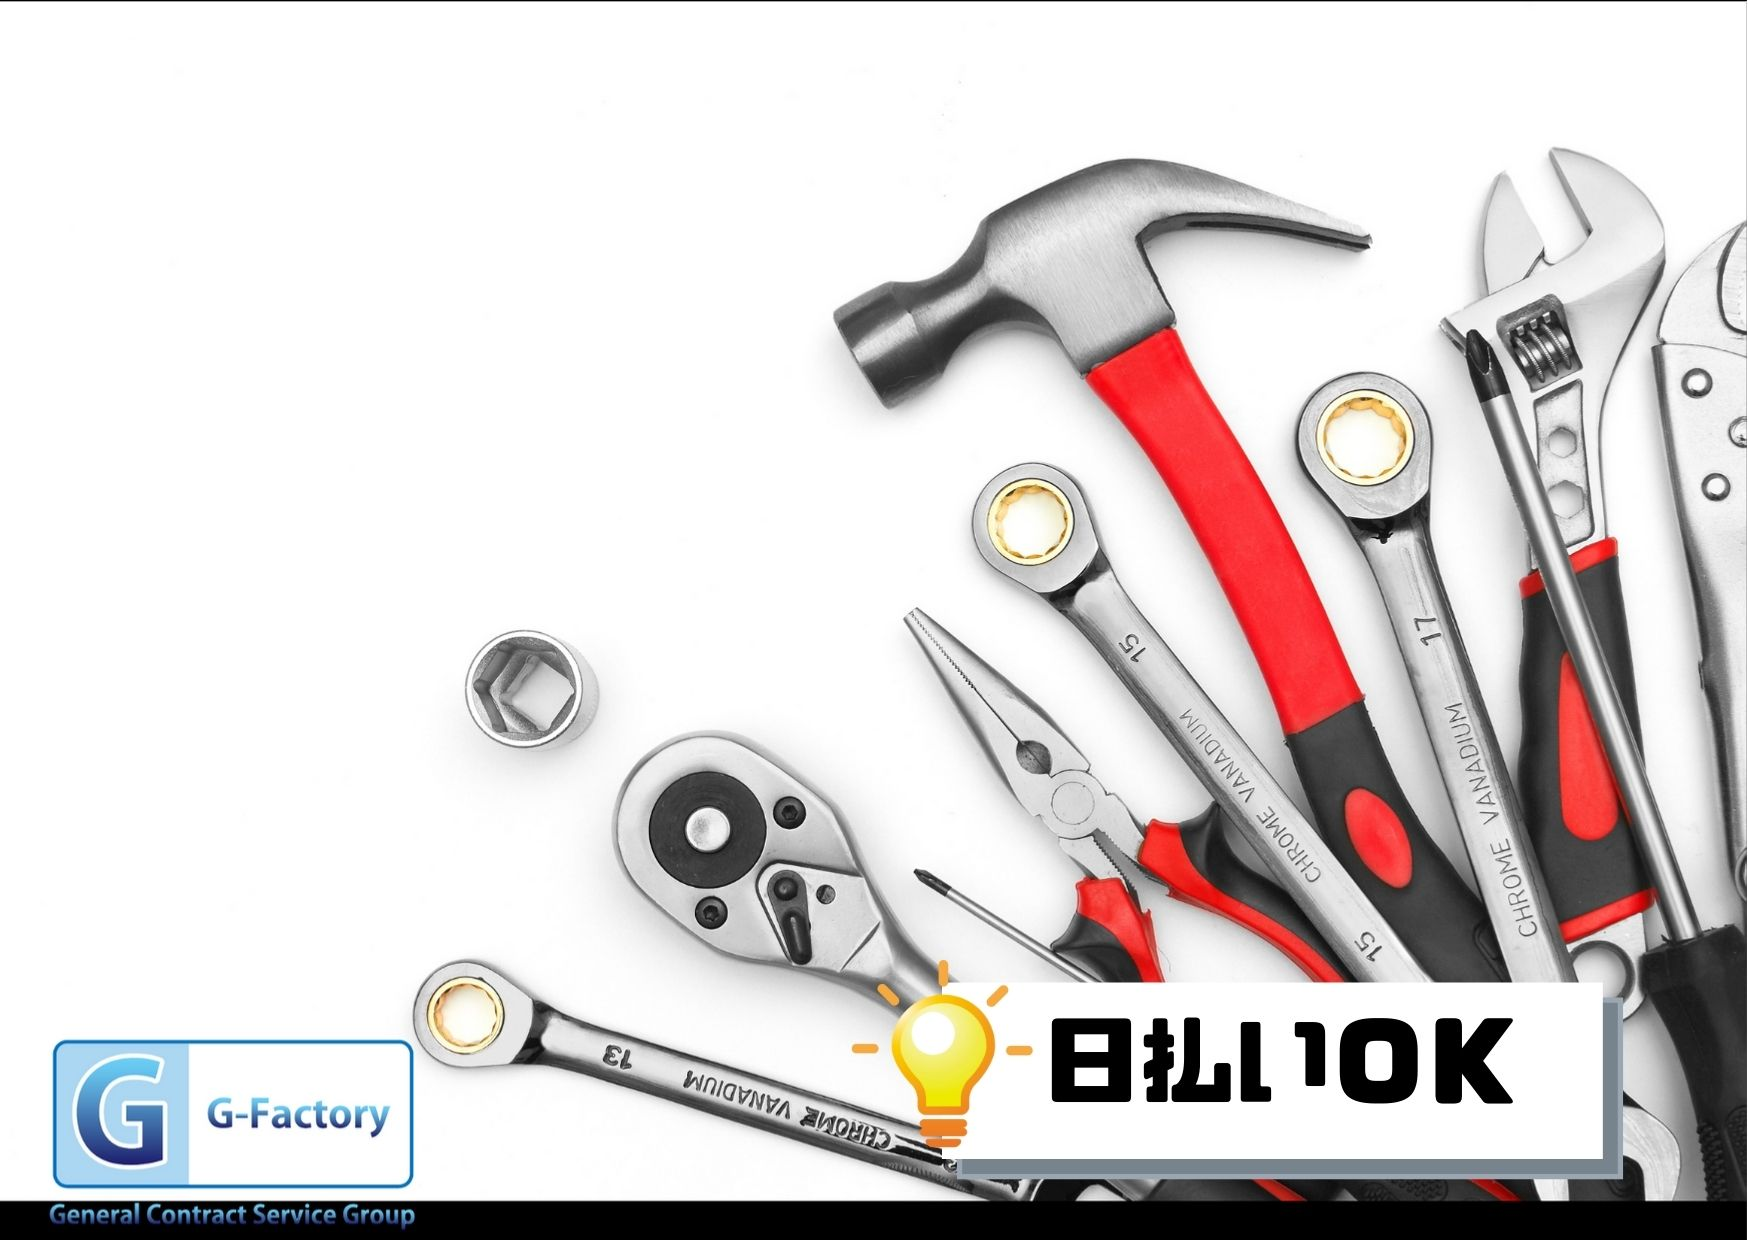 家庭用給湯器の組立・検査業務